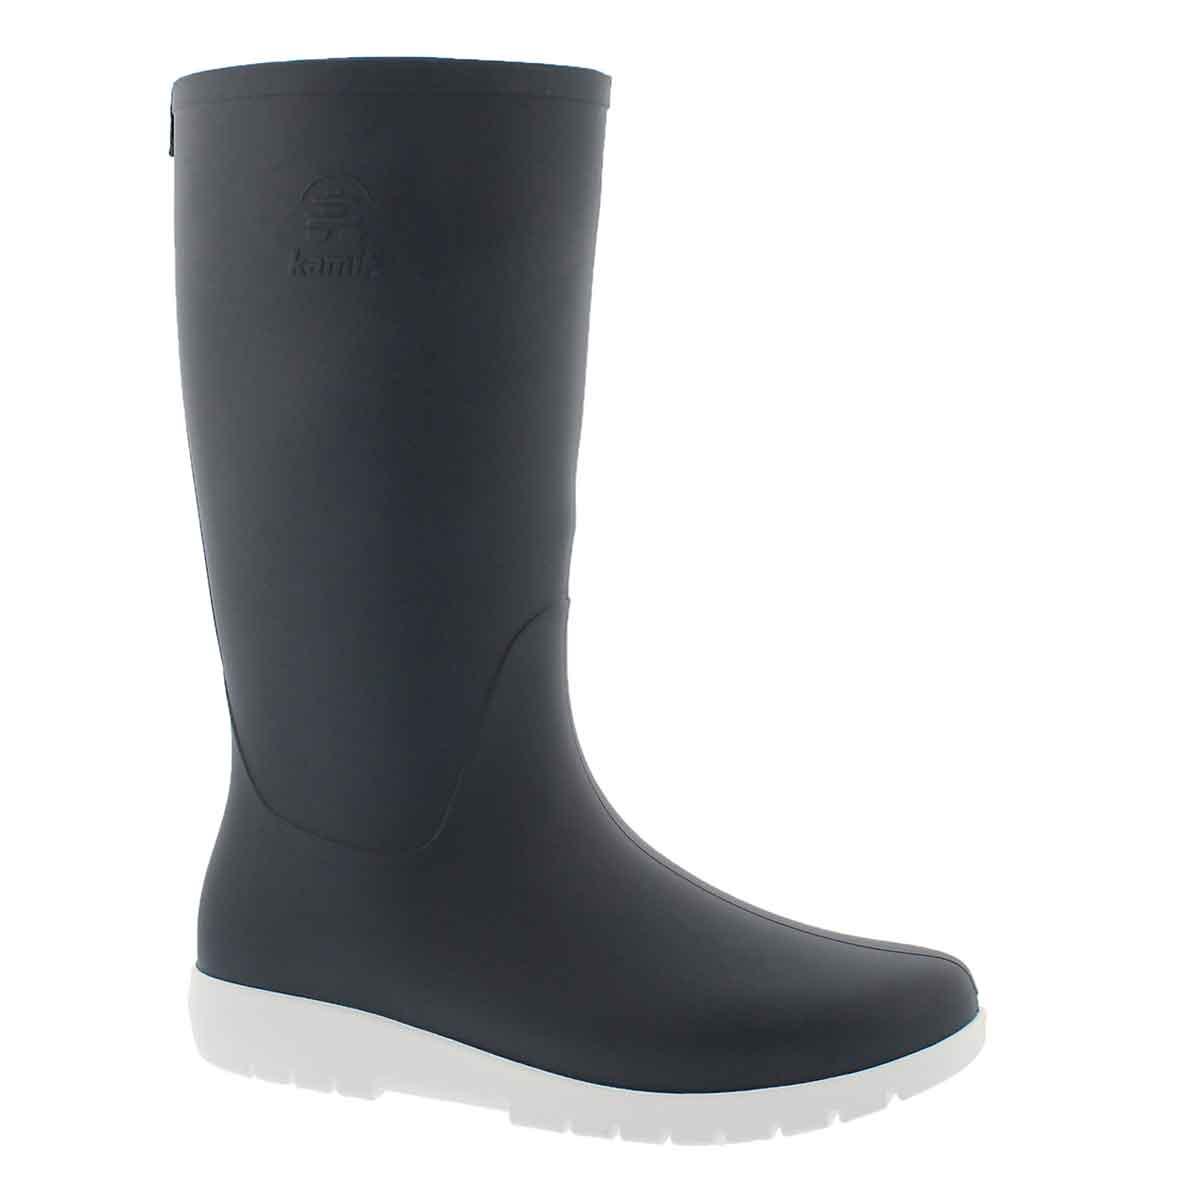 Women's JESSIE navy mid waterproof rain boots